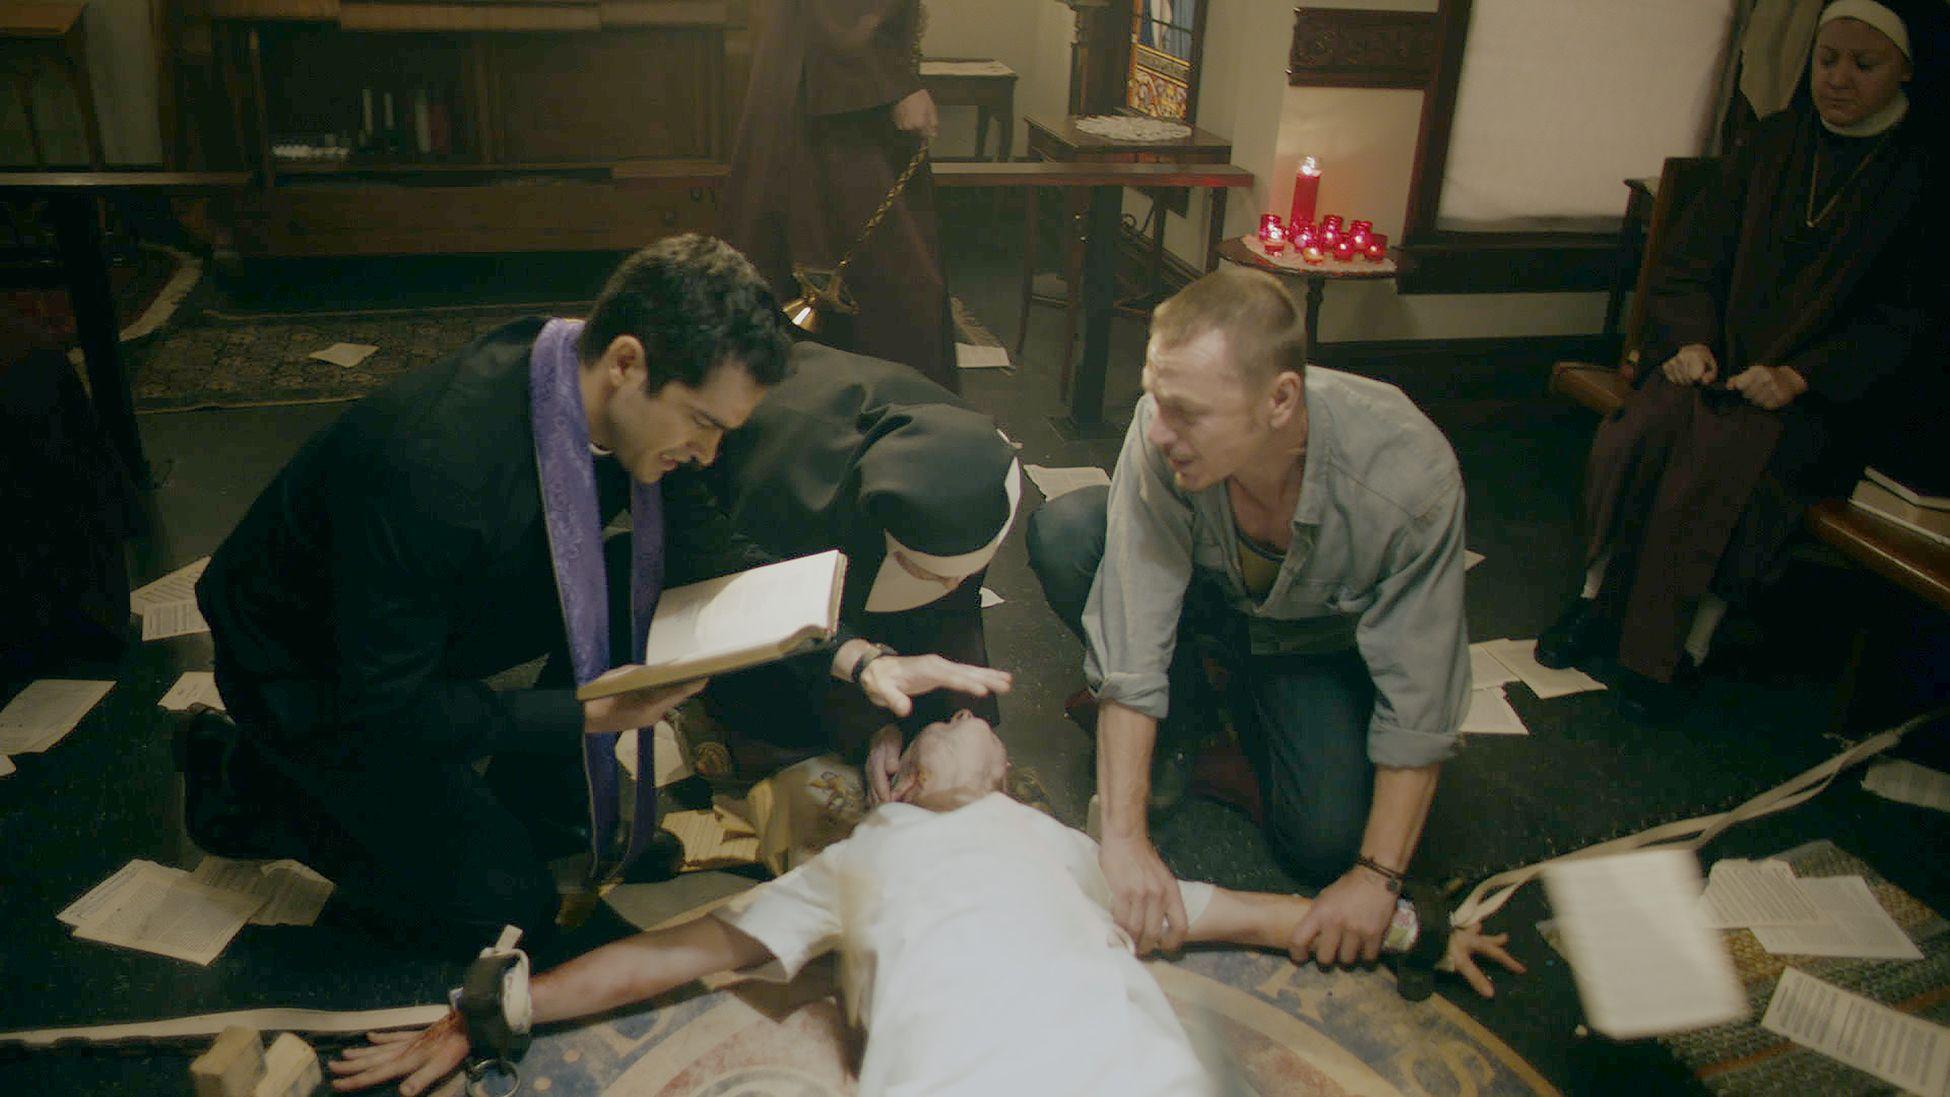 the exorcist s01e10 subtitles